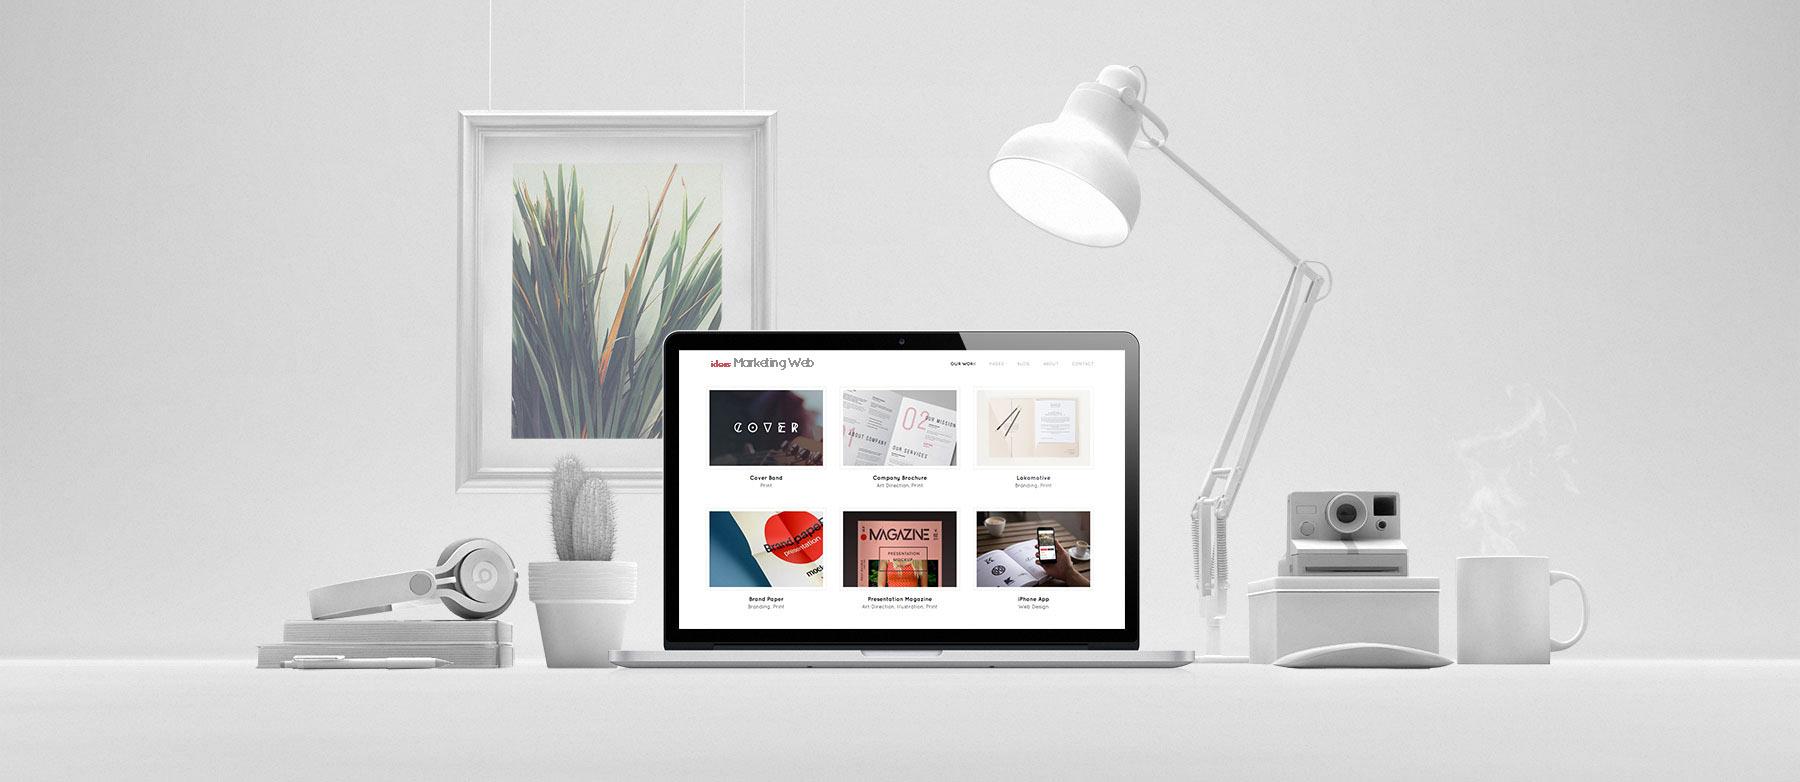 home-feature-21-ideas-marketing-web